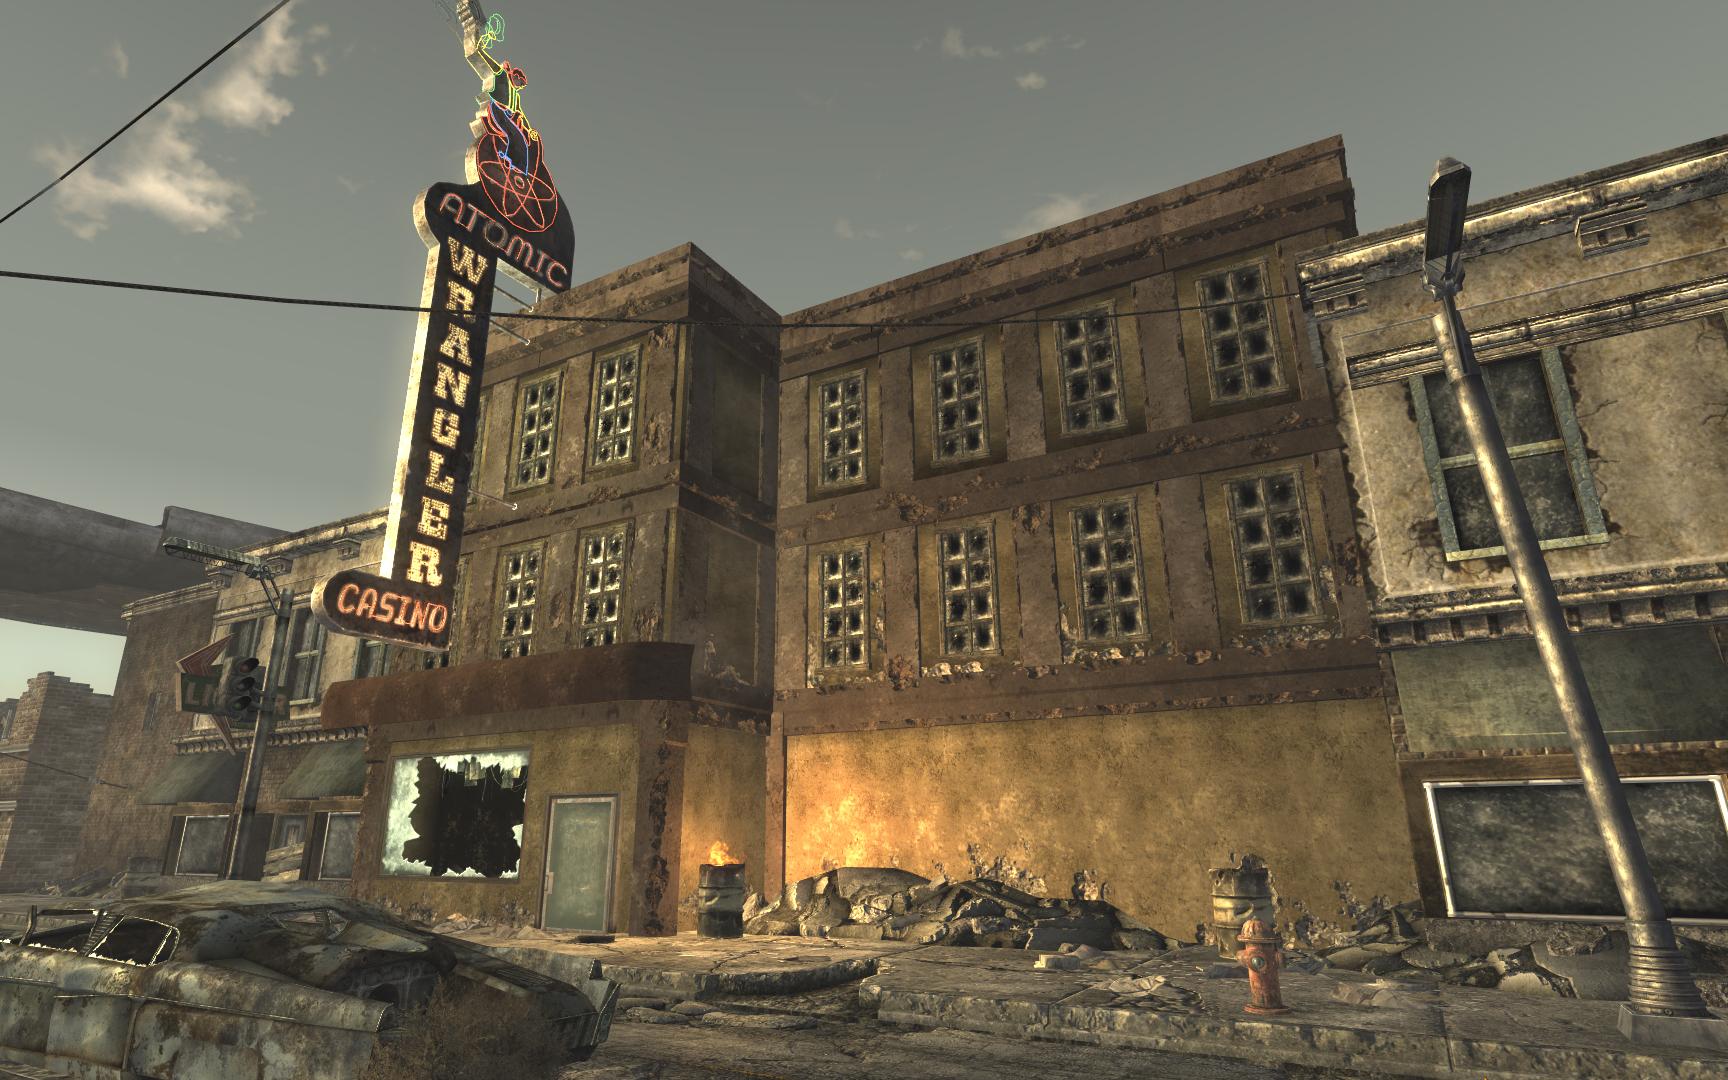 Atomic Wrangler casino | Fallout Wiki | FANDOM powered by Wikia